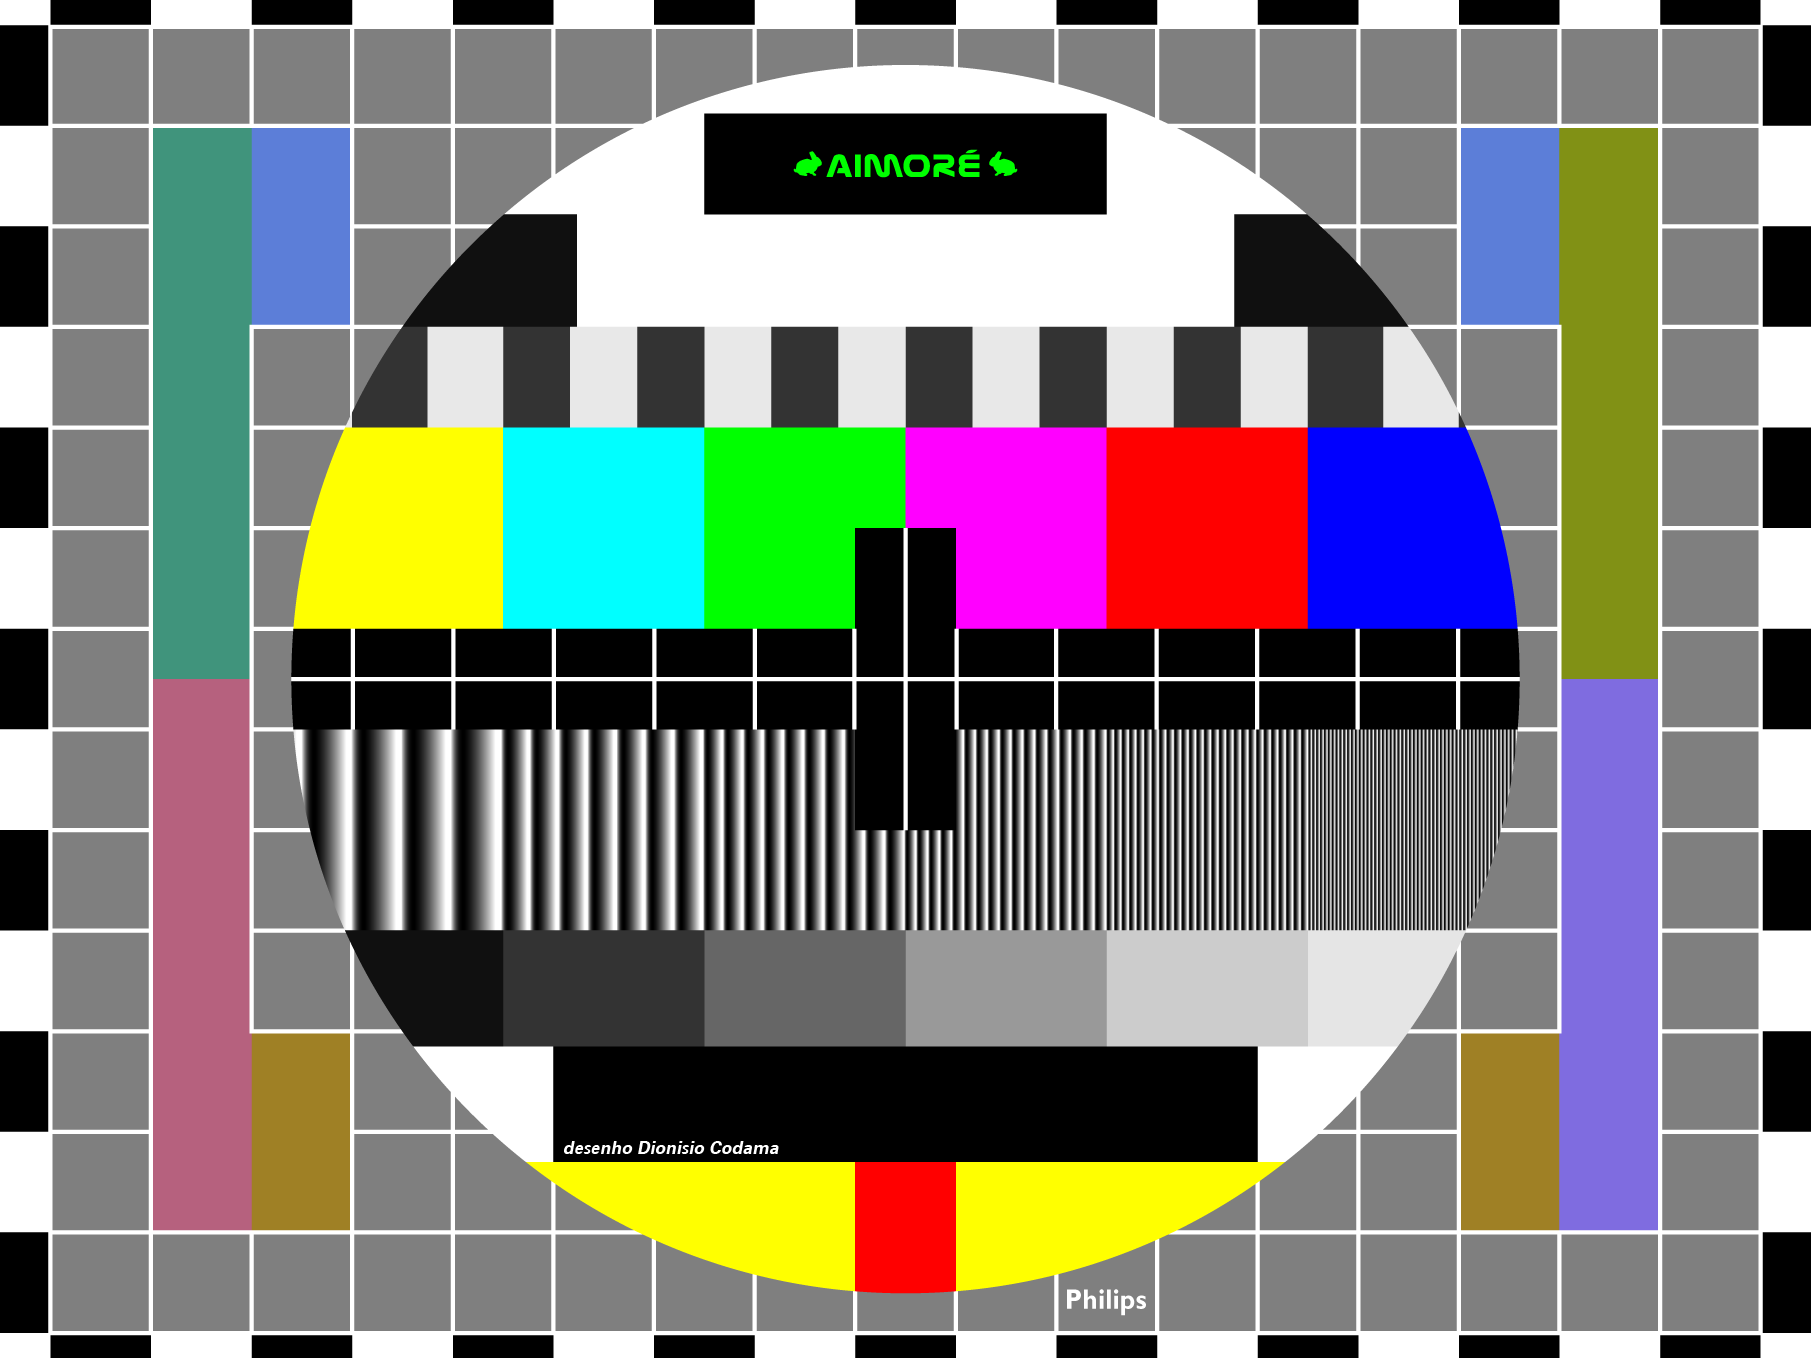 Radio 95fm Curitiba Aimore Video Test